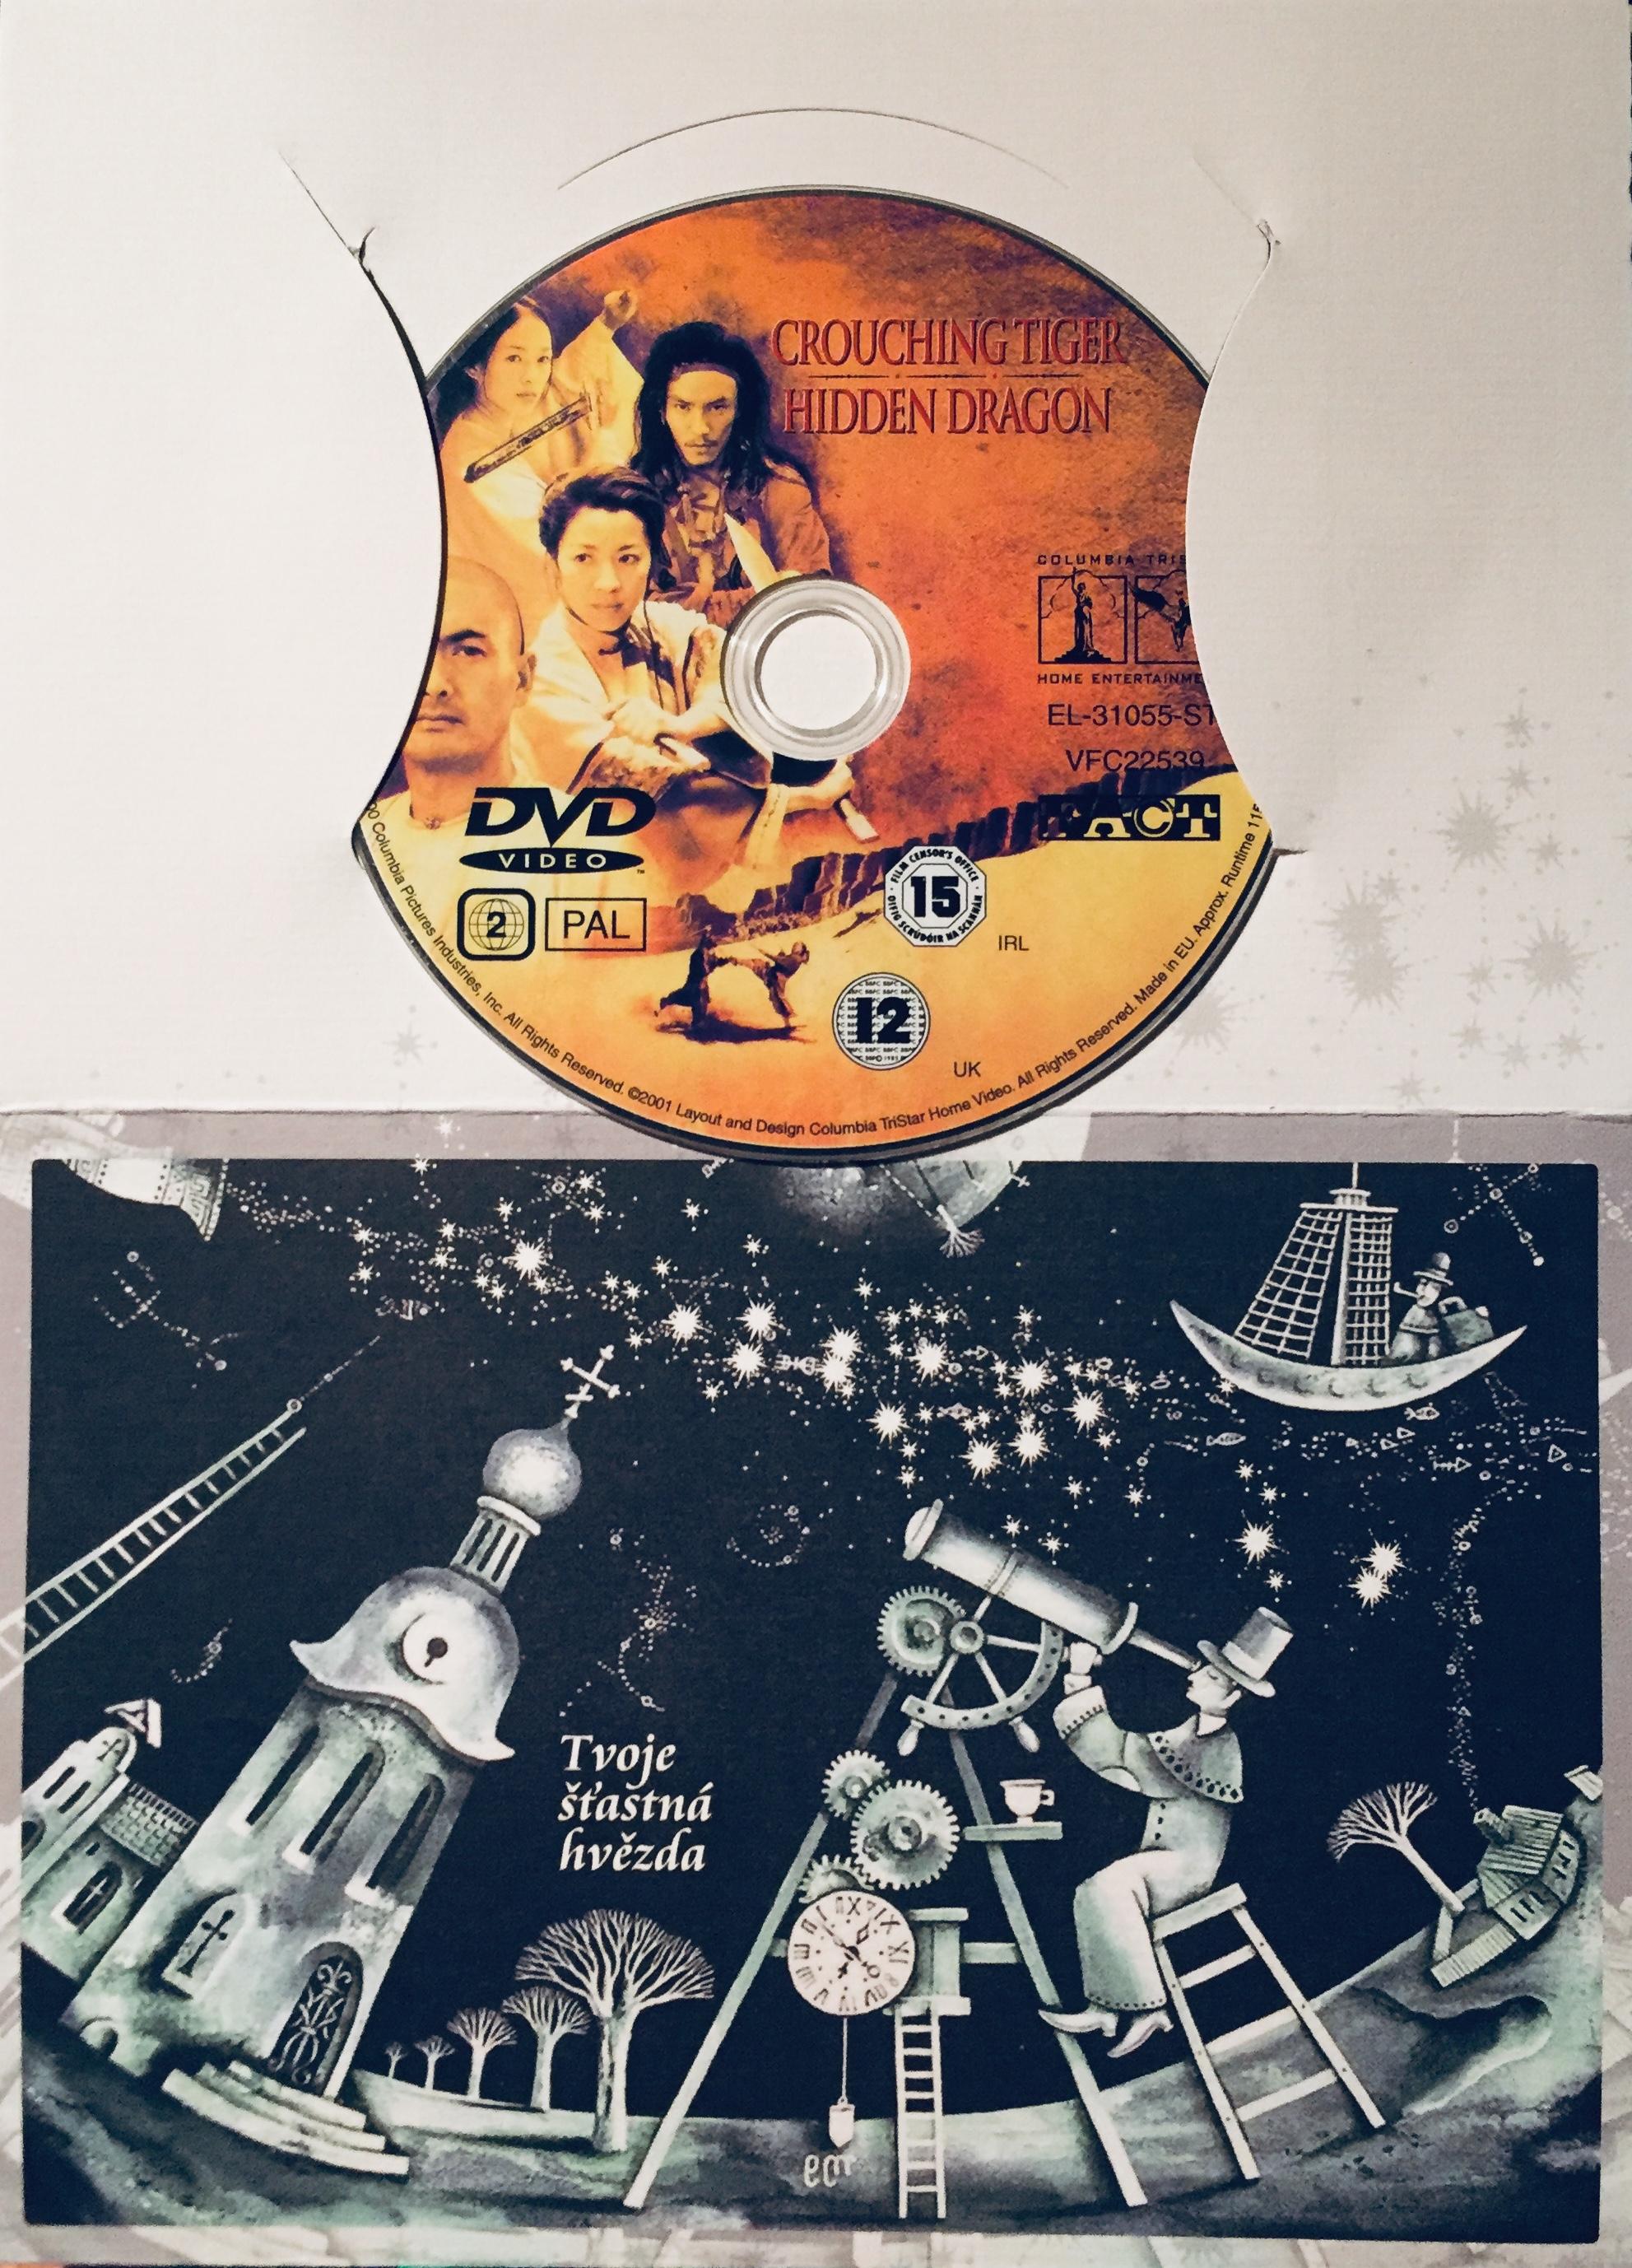 Crouching Tiger - Hidden Dragon / Tygr a drak - Meč osudu - DVD /dárkový obal/